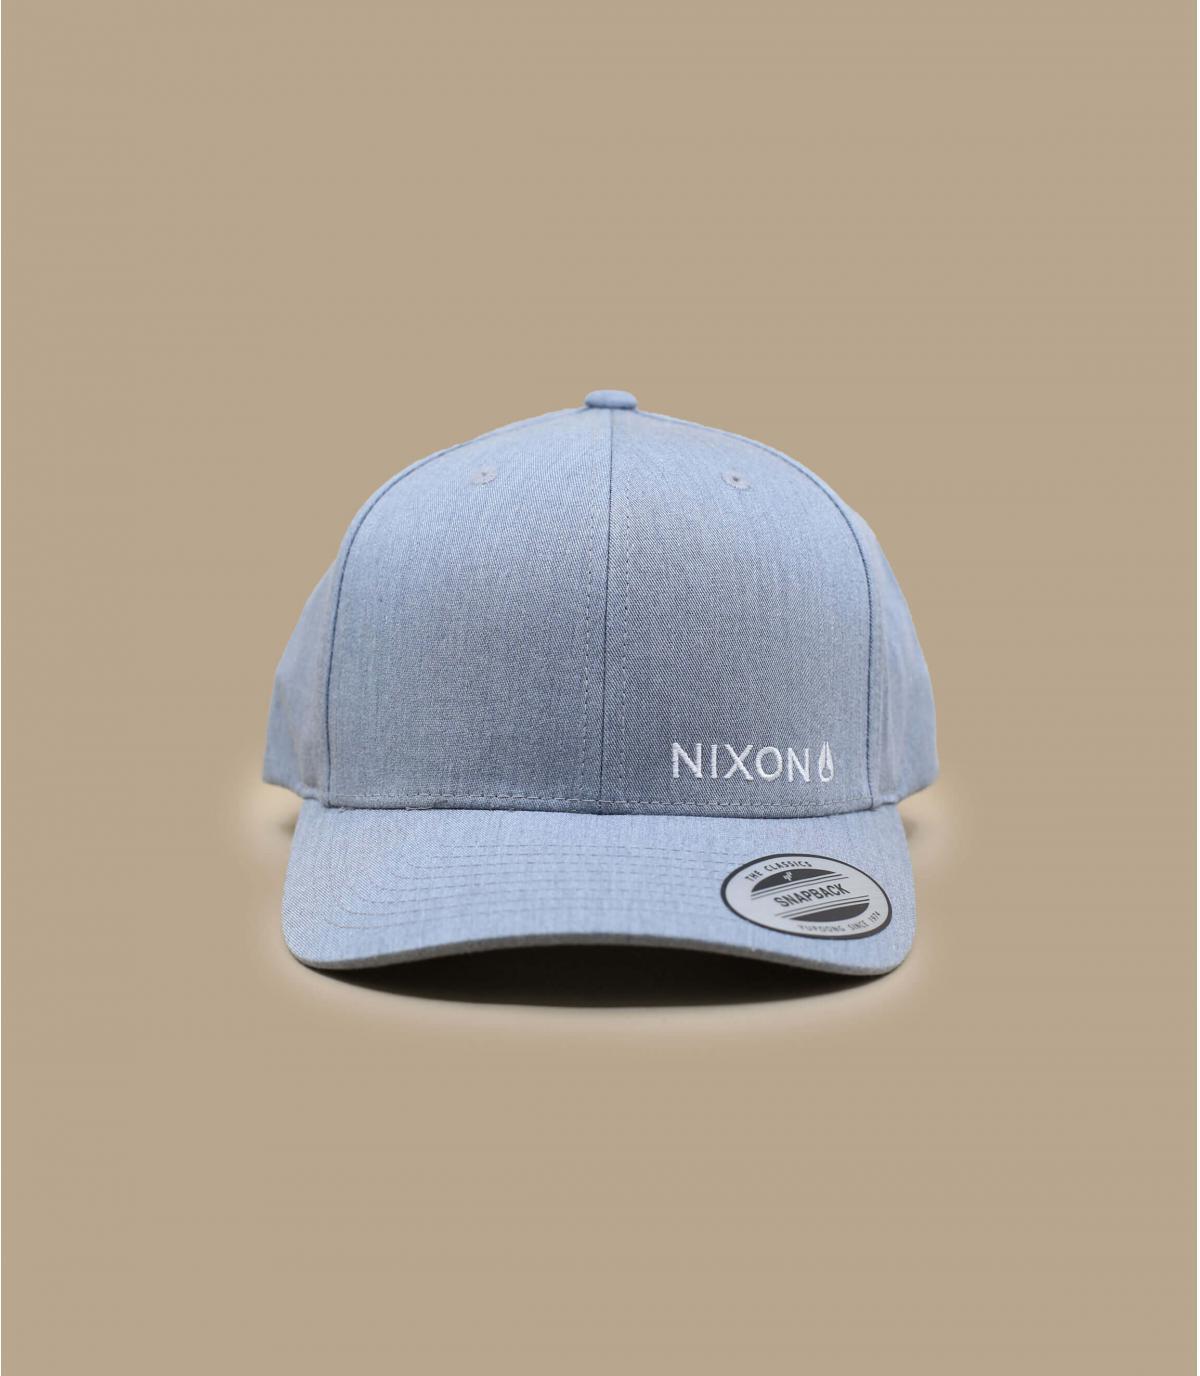 Nixon heather grey snapback - Lockup heather grey by Nixon. Headict 48418d4b4bba